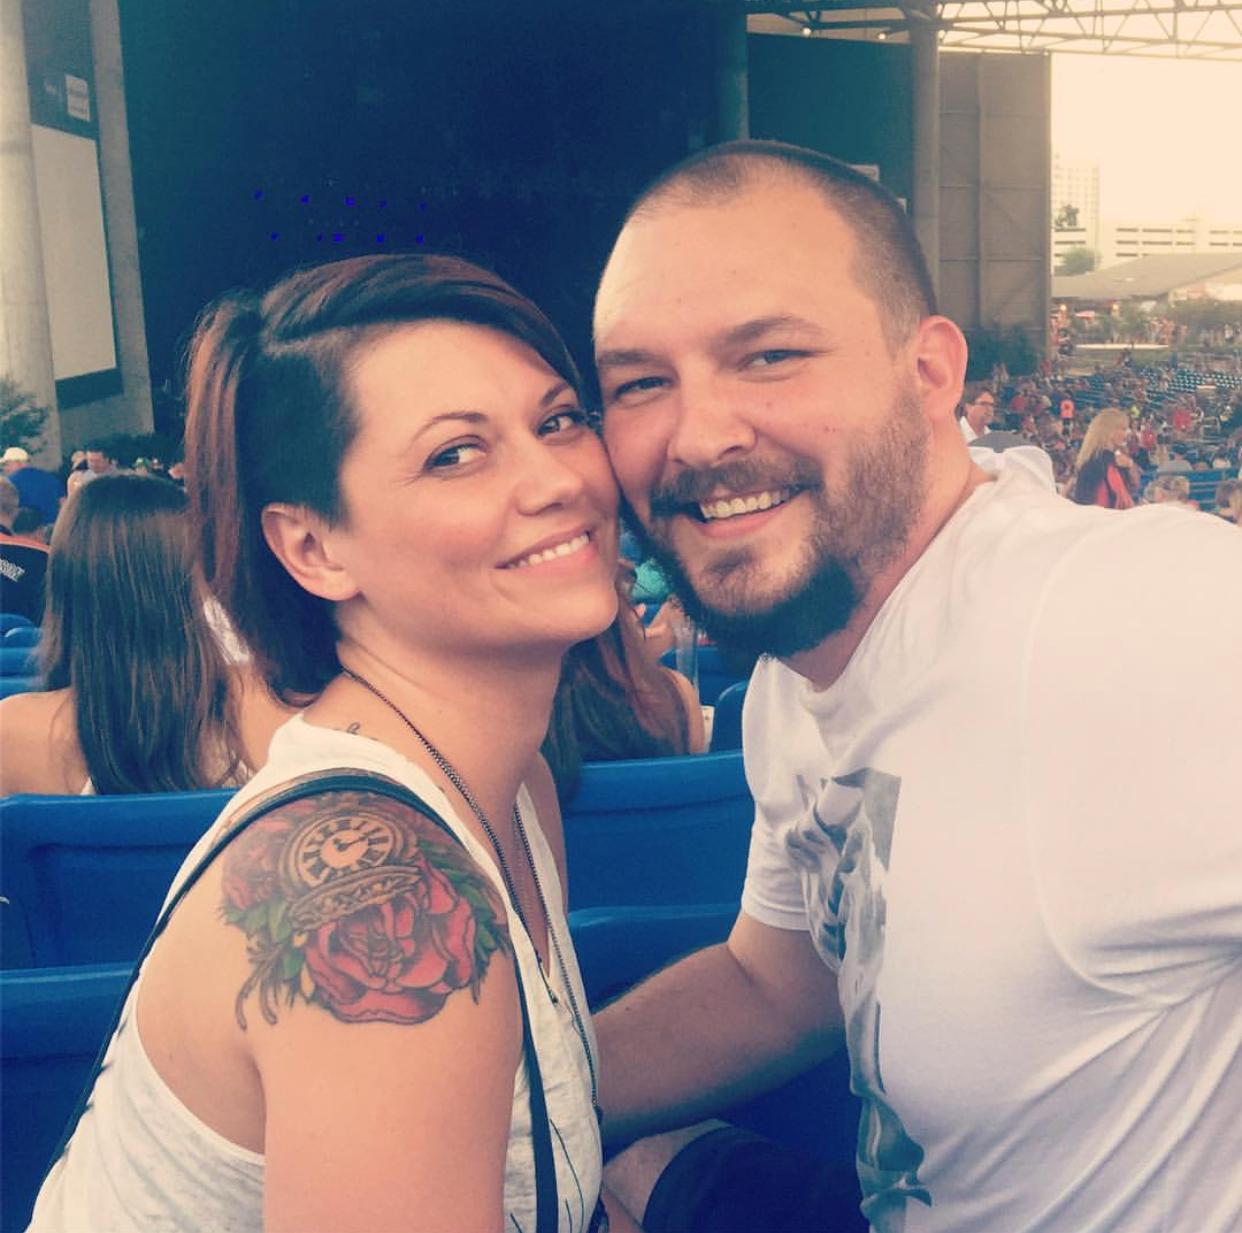 Teresa and Andrew - Cris Stapelton concert